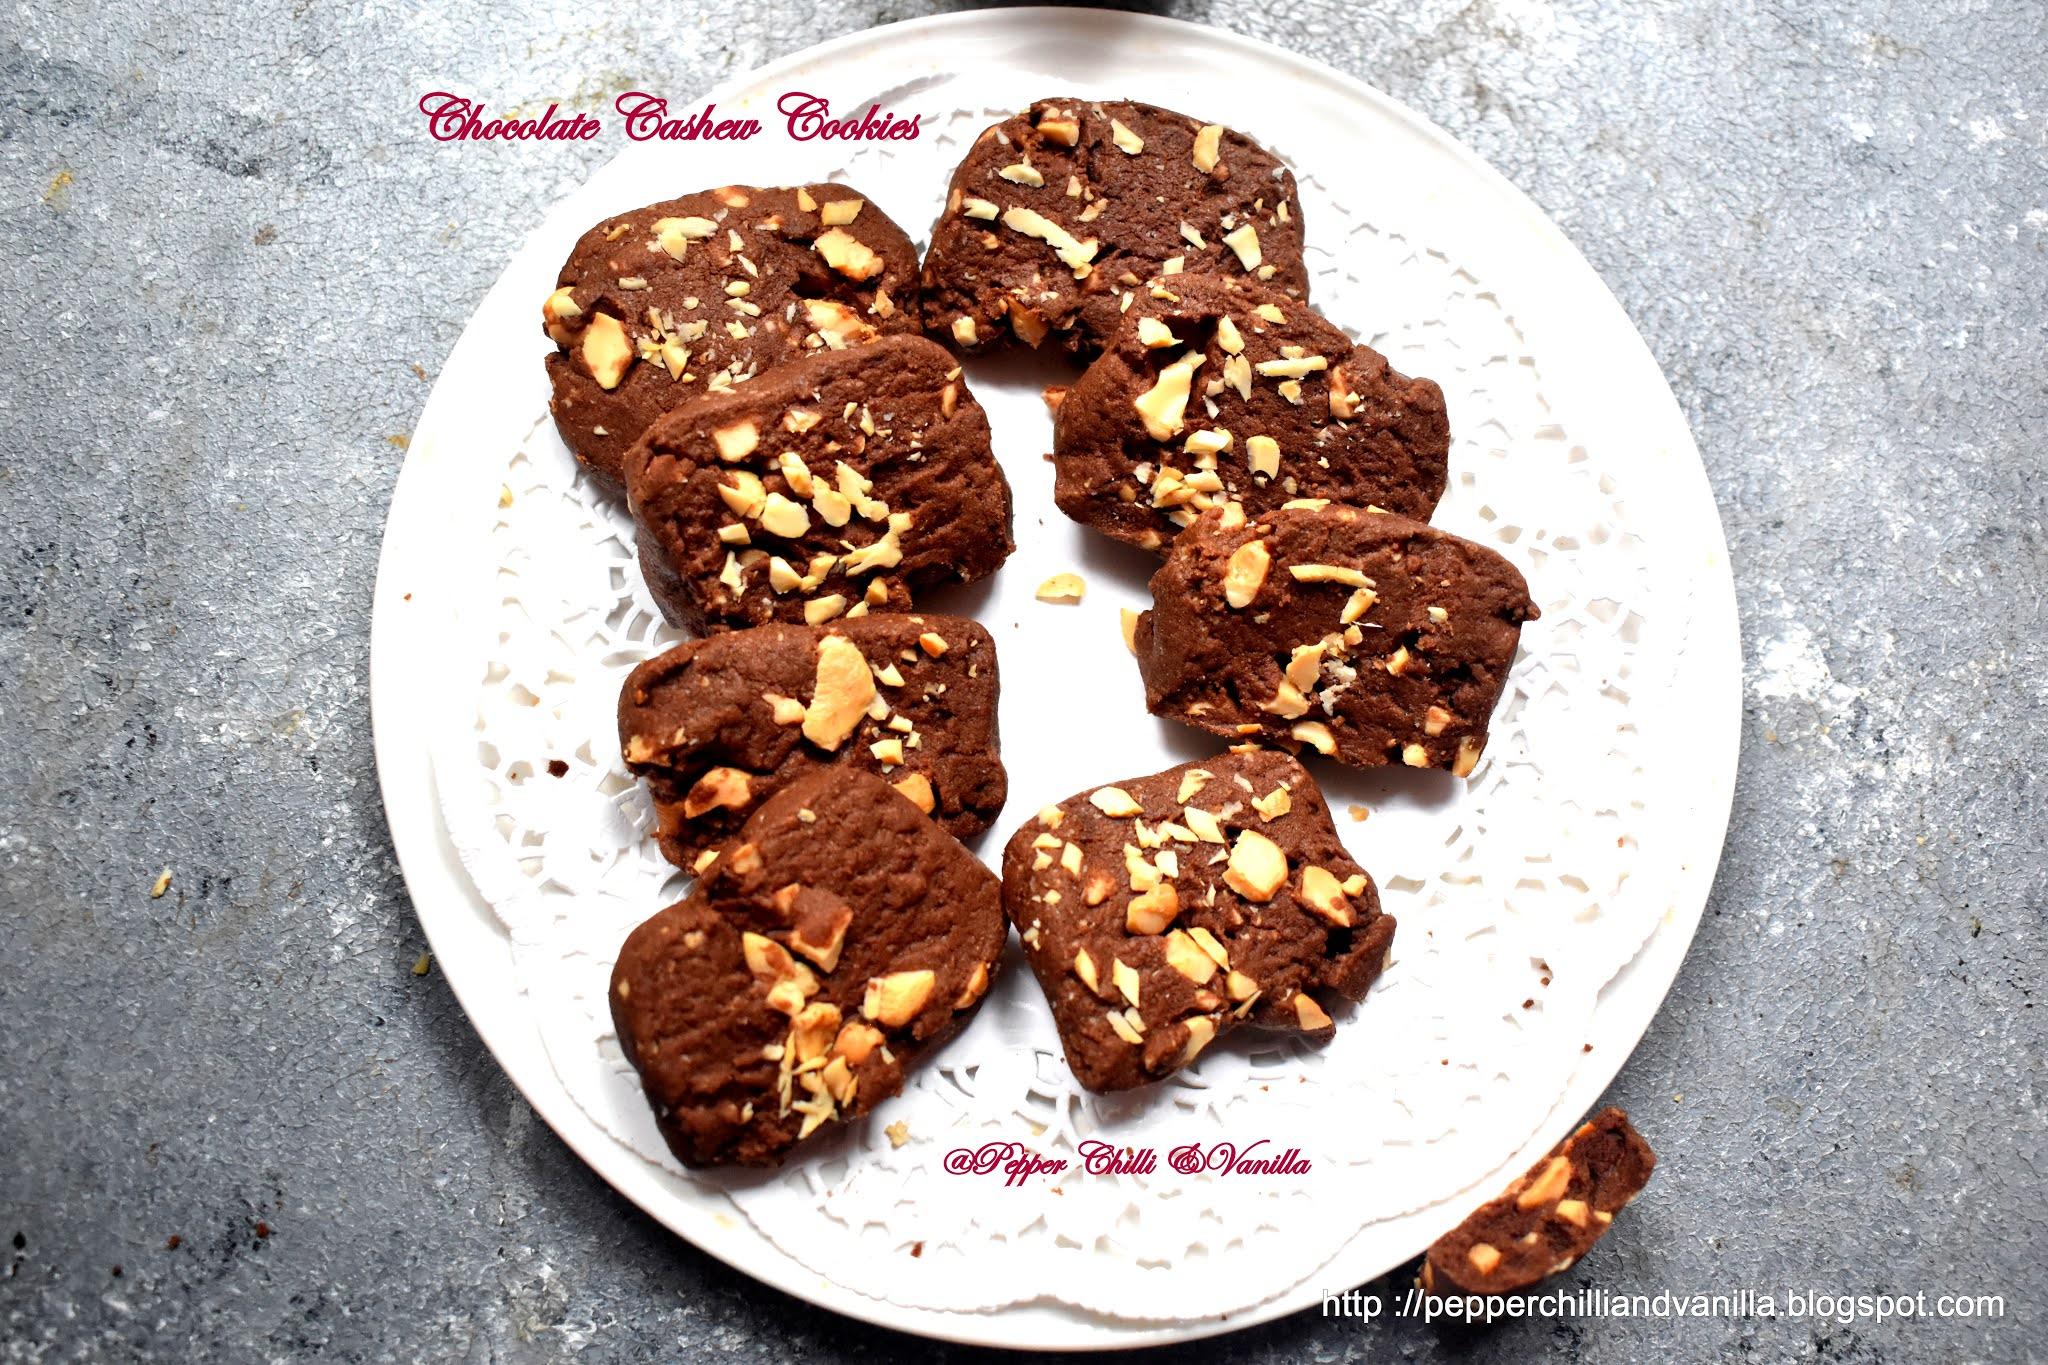 Eggless Chocolate Cashew Cookies